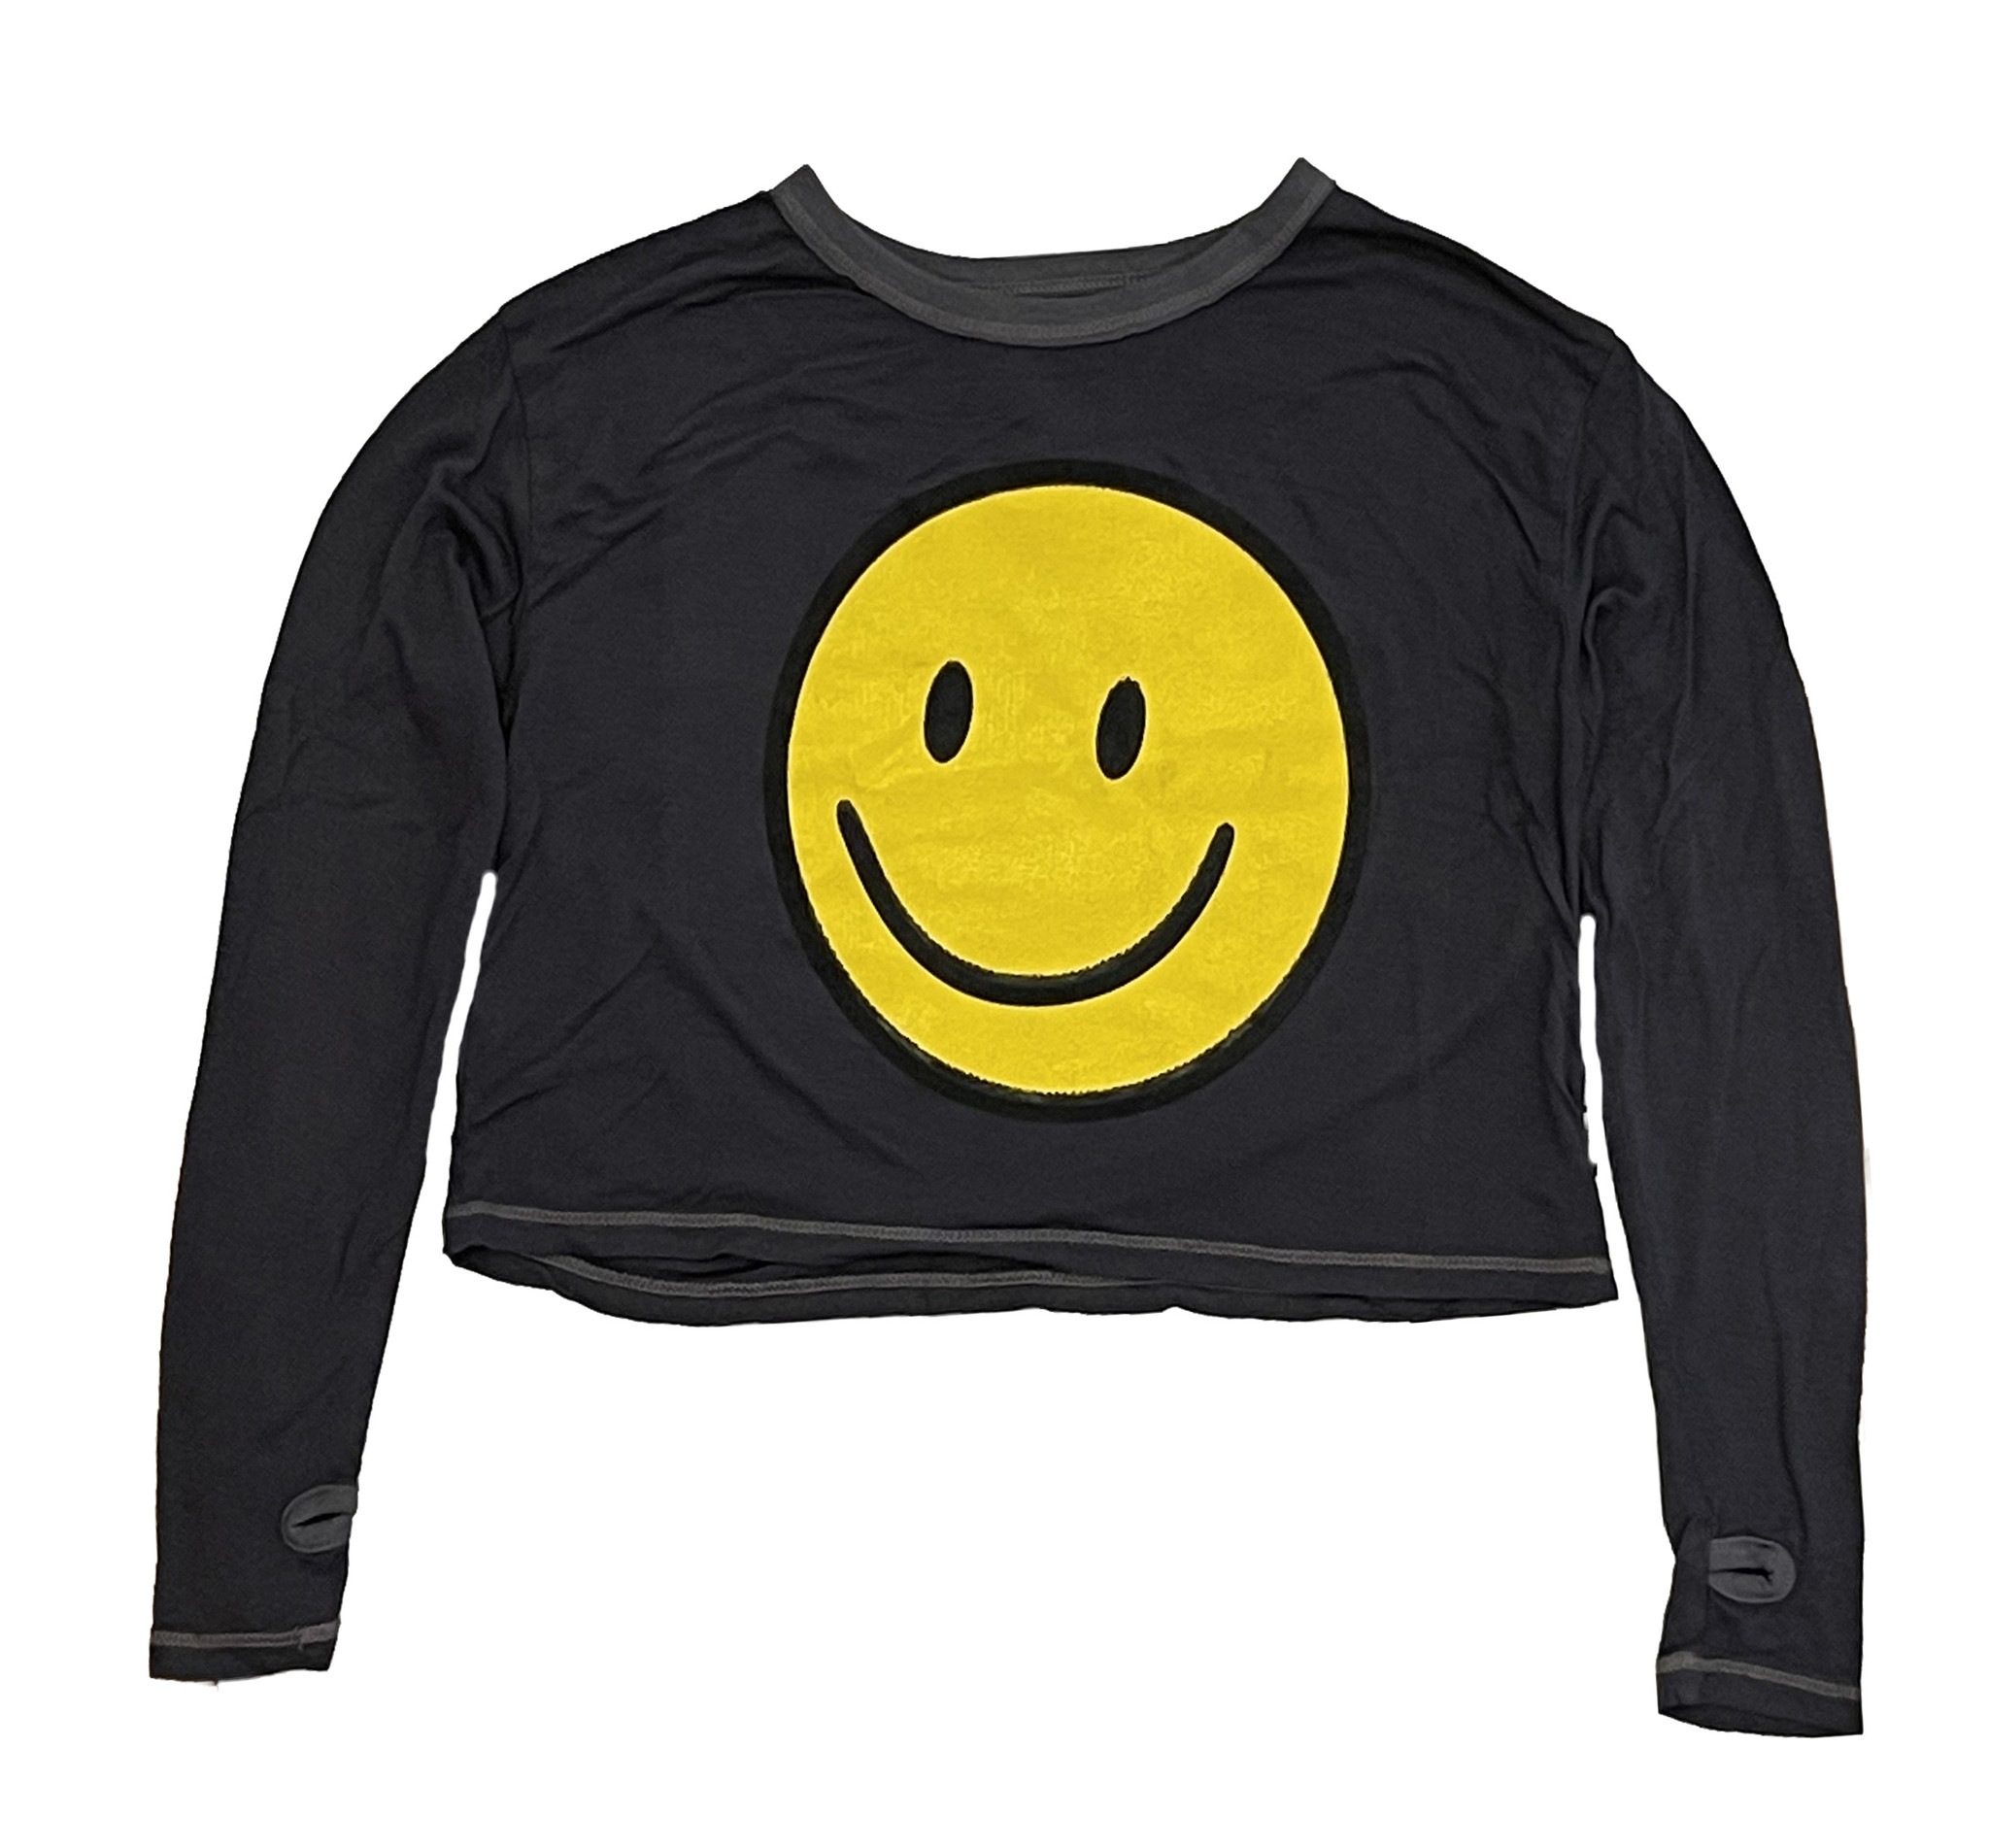 T2Love Charcoal Smiley Crop Top